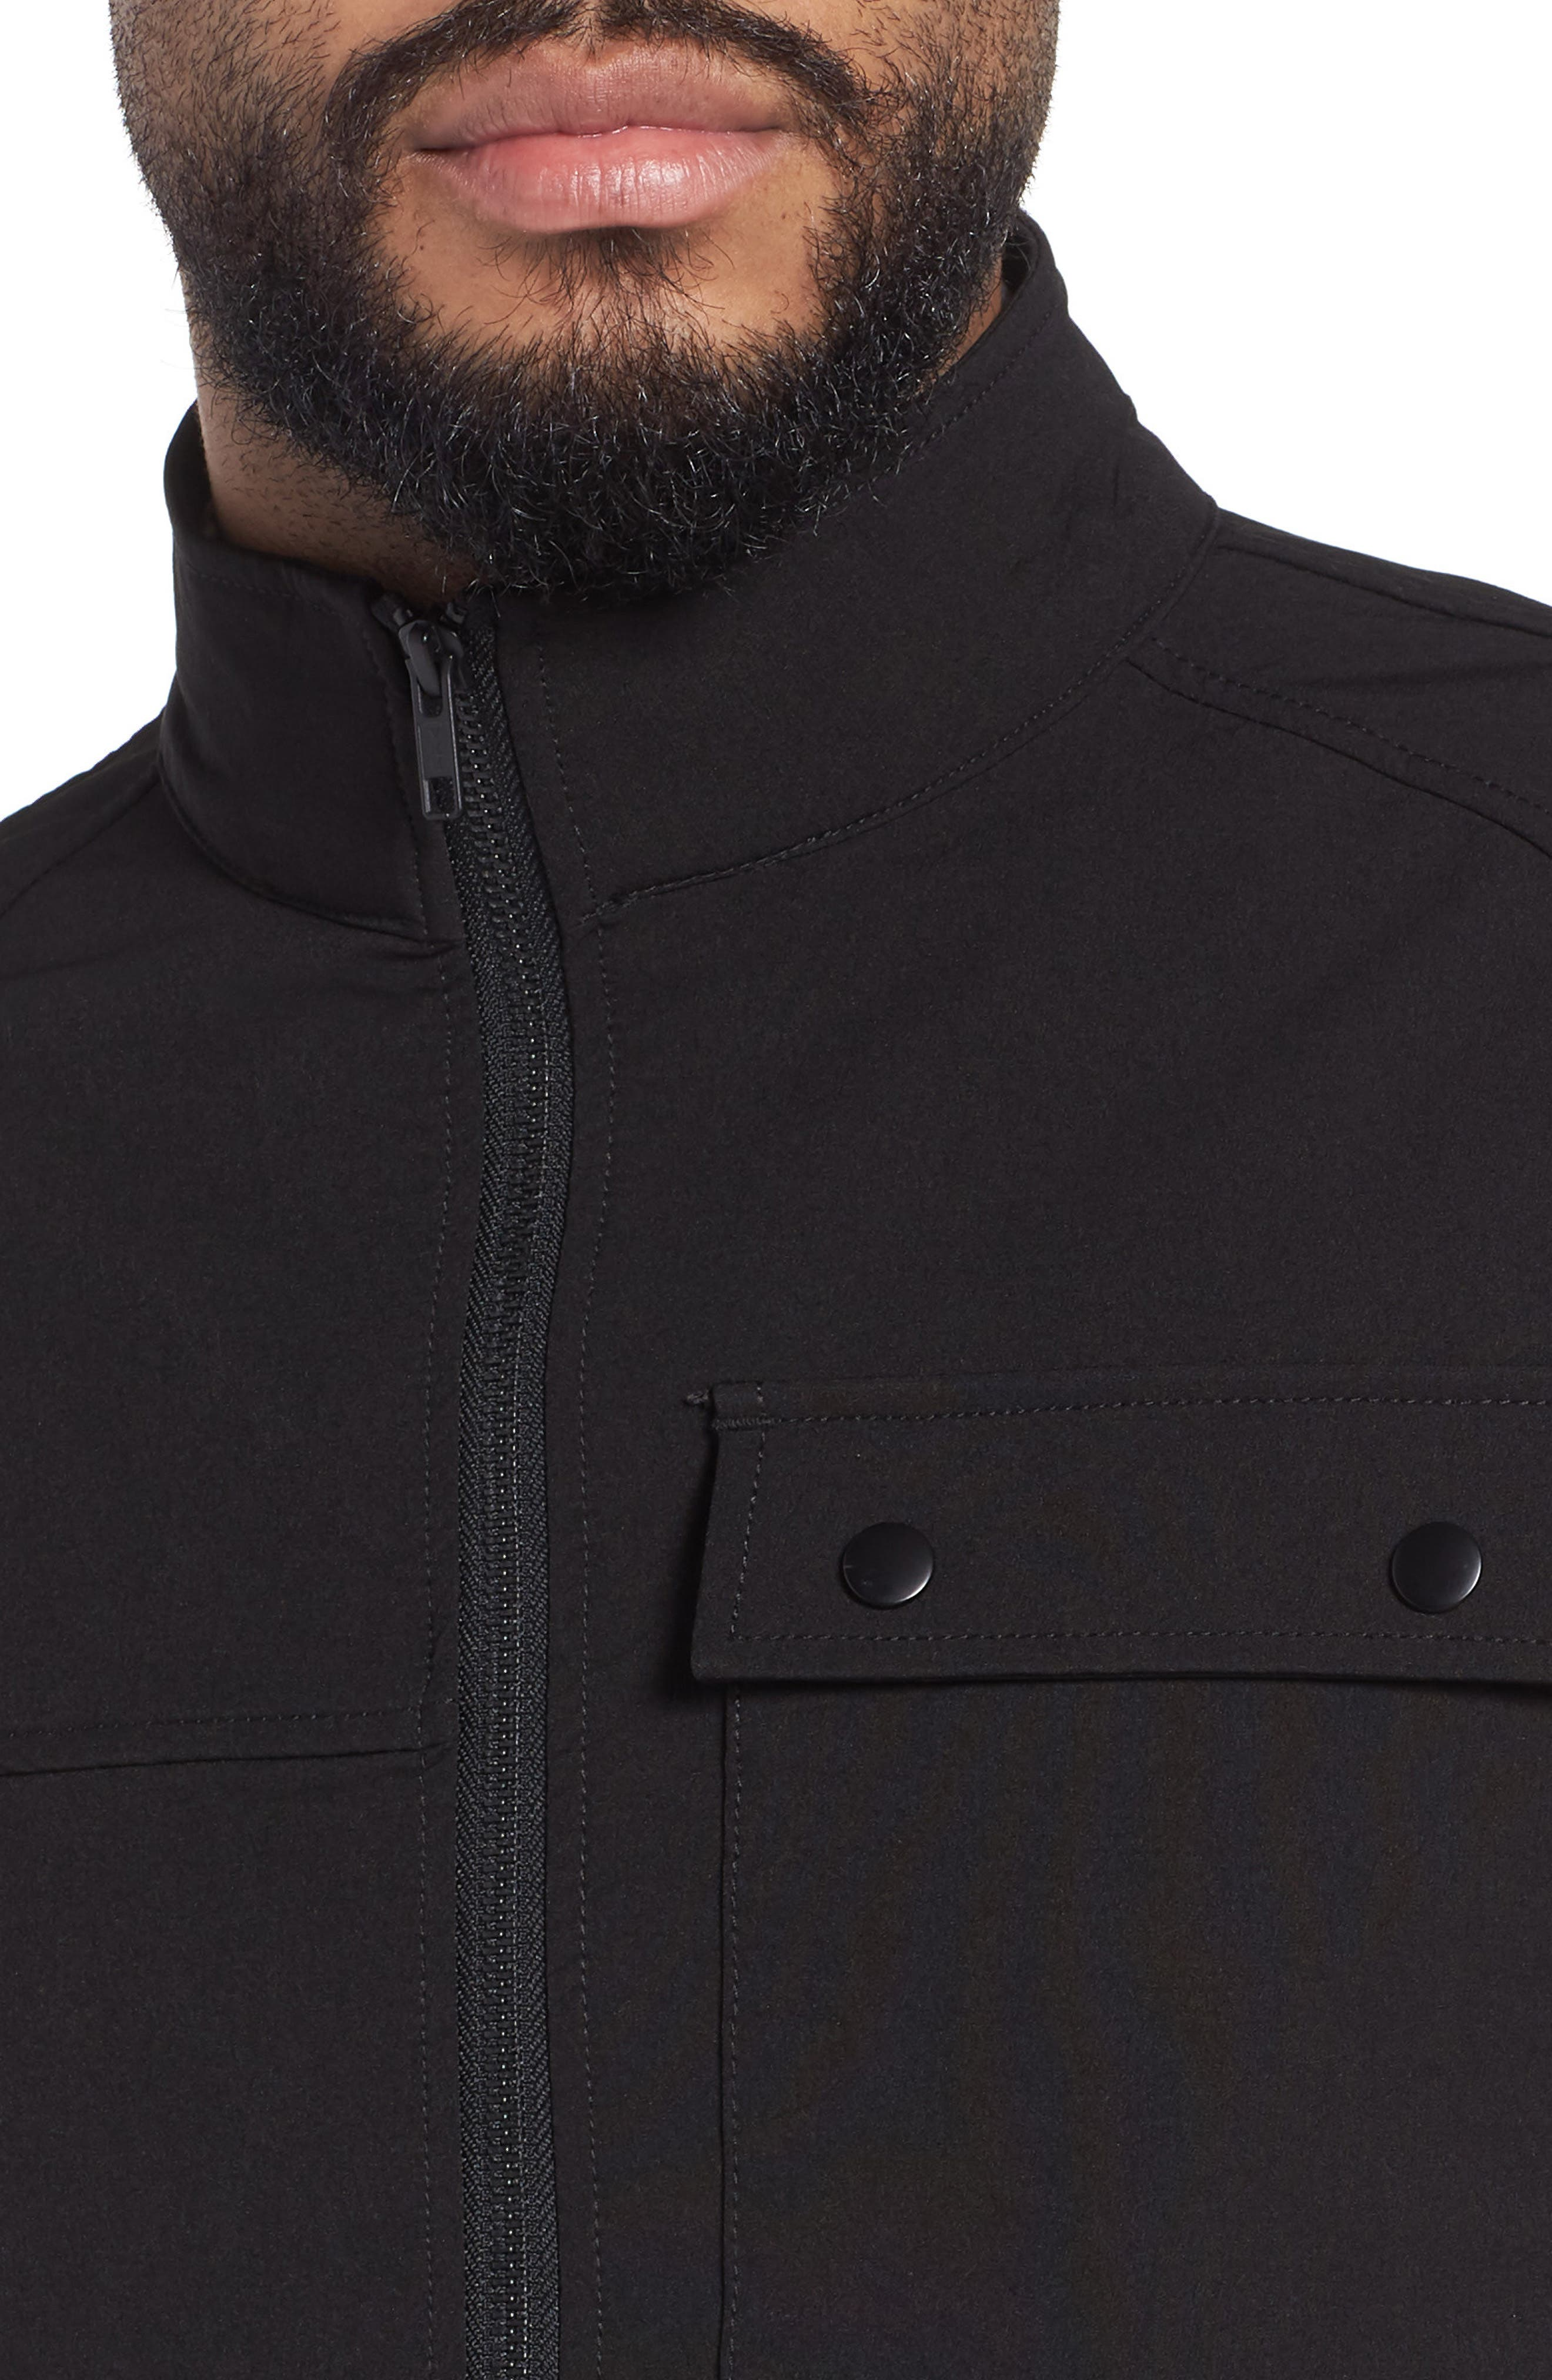 Tech Jacket,                             Alternate thumbnail 4, color,                             001